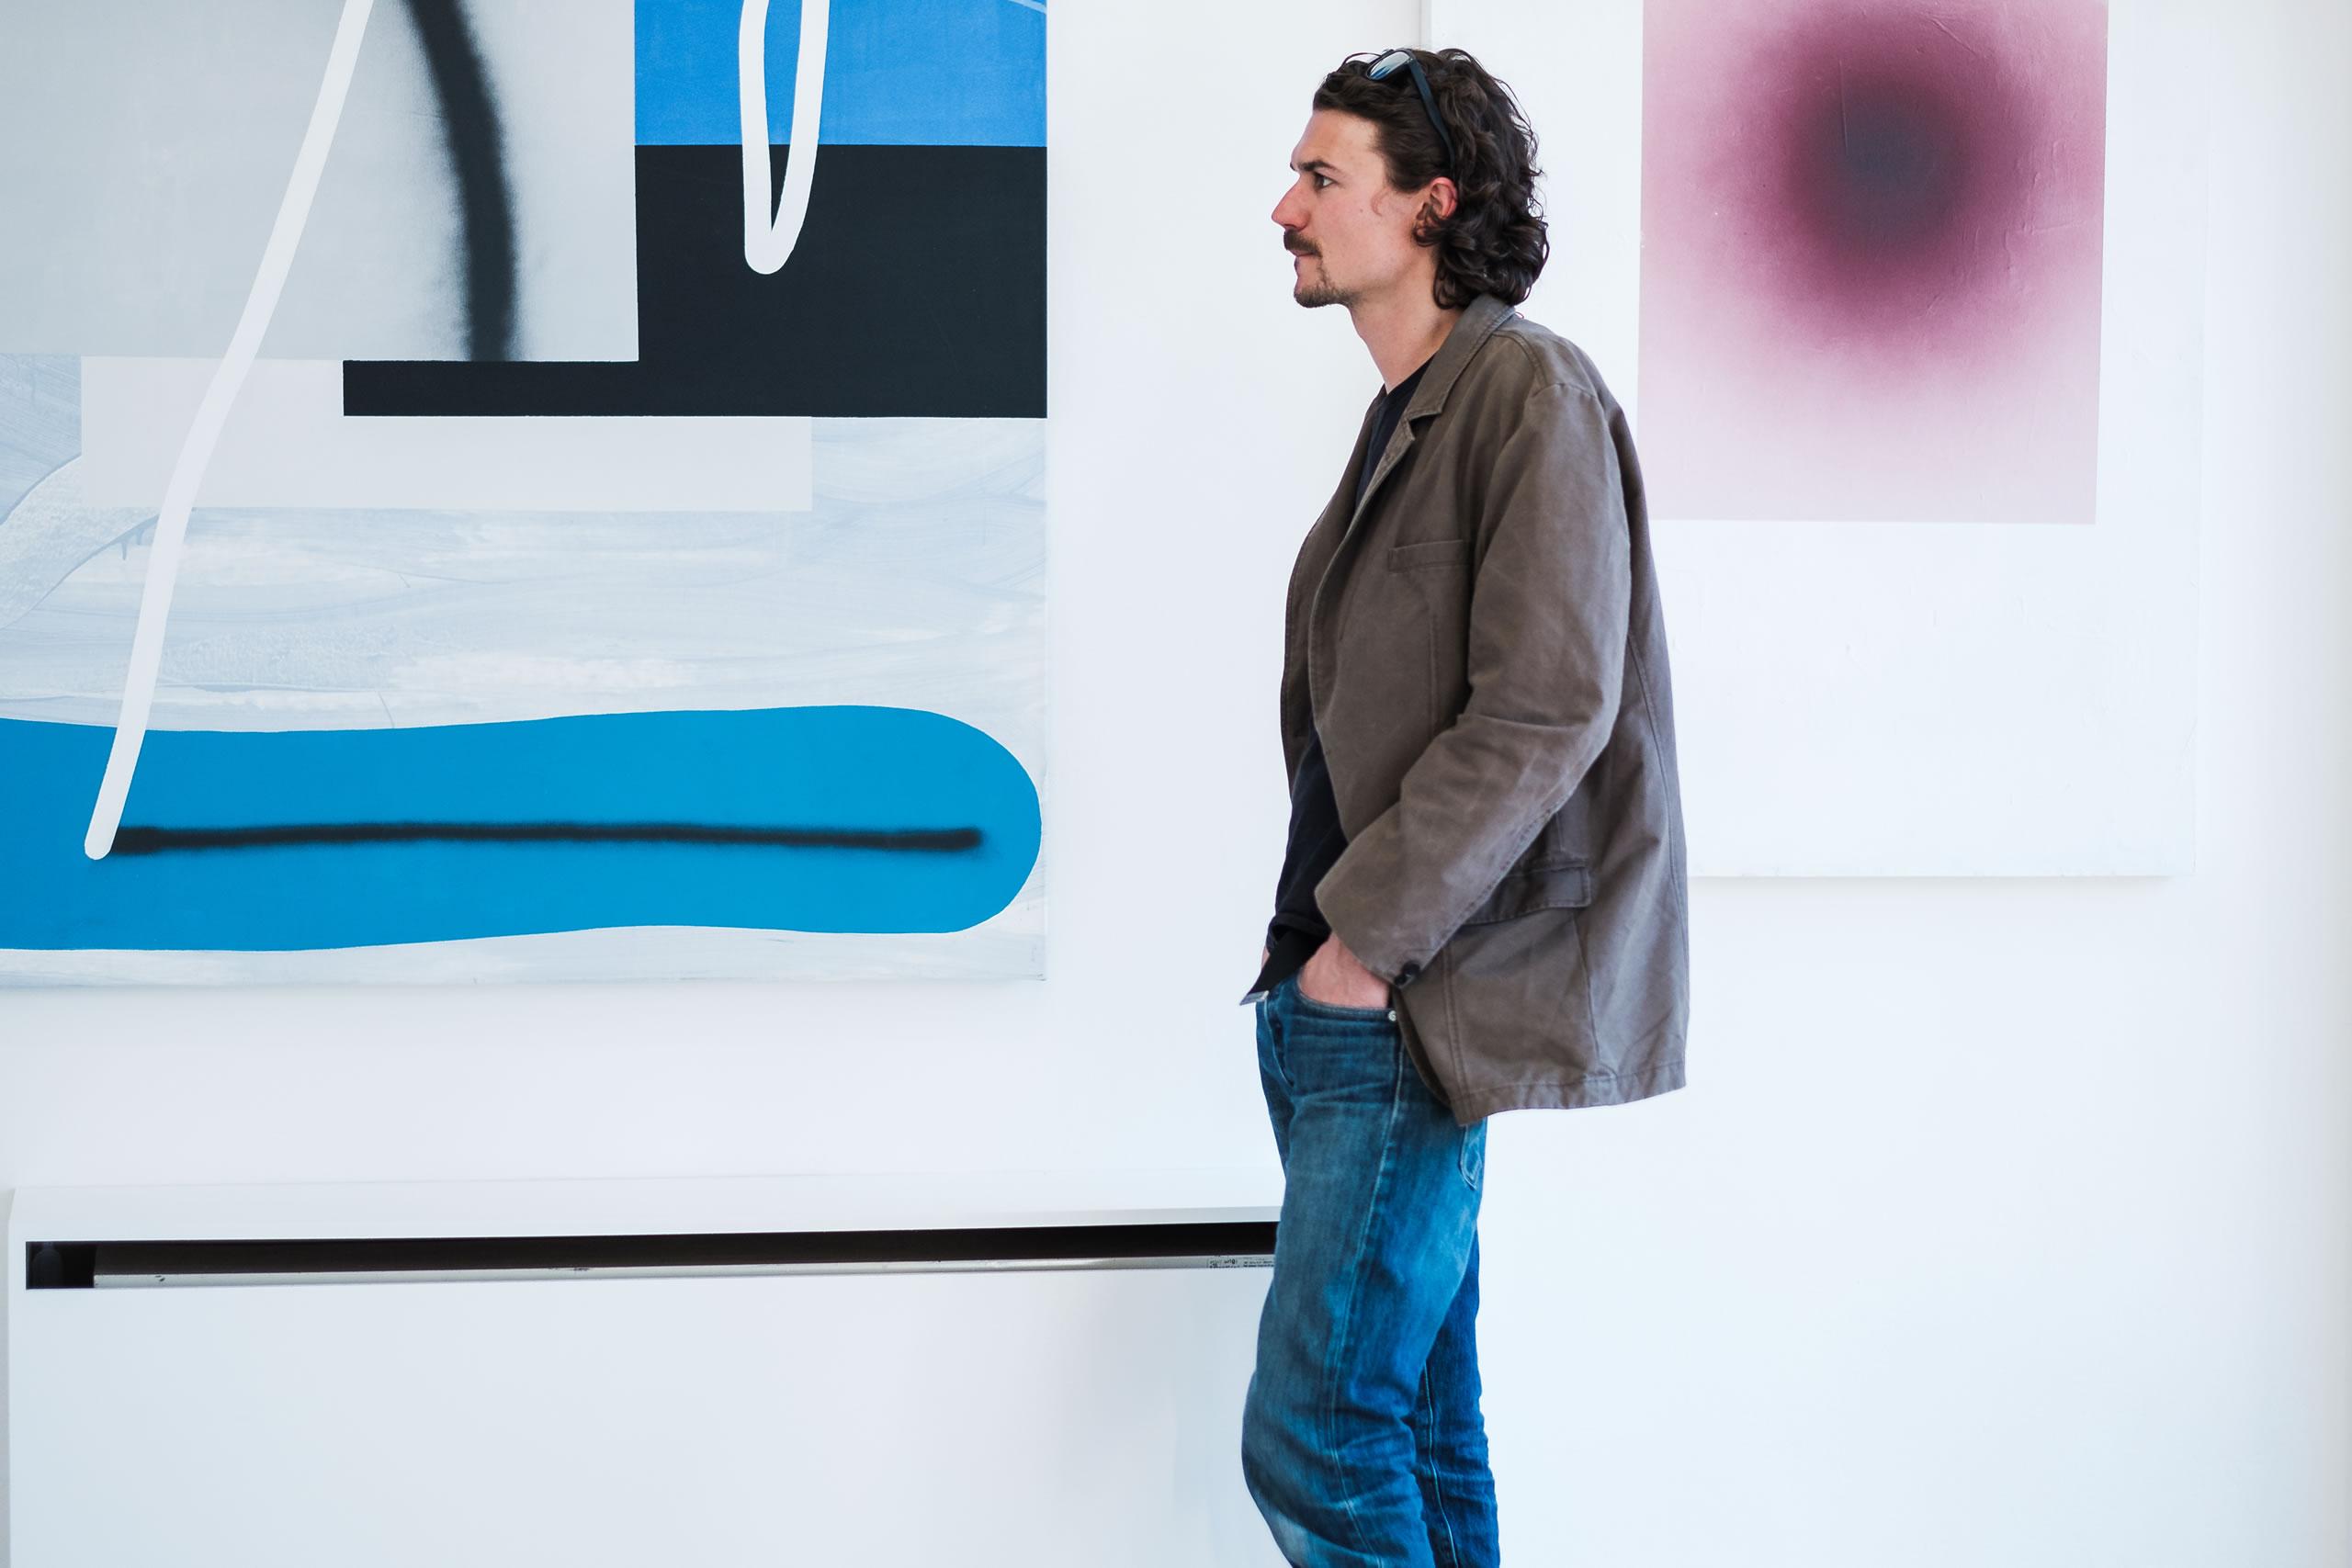 David Mase | Foto: Manu Lasnik | Galerie3 Velden